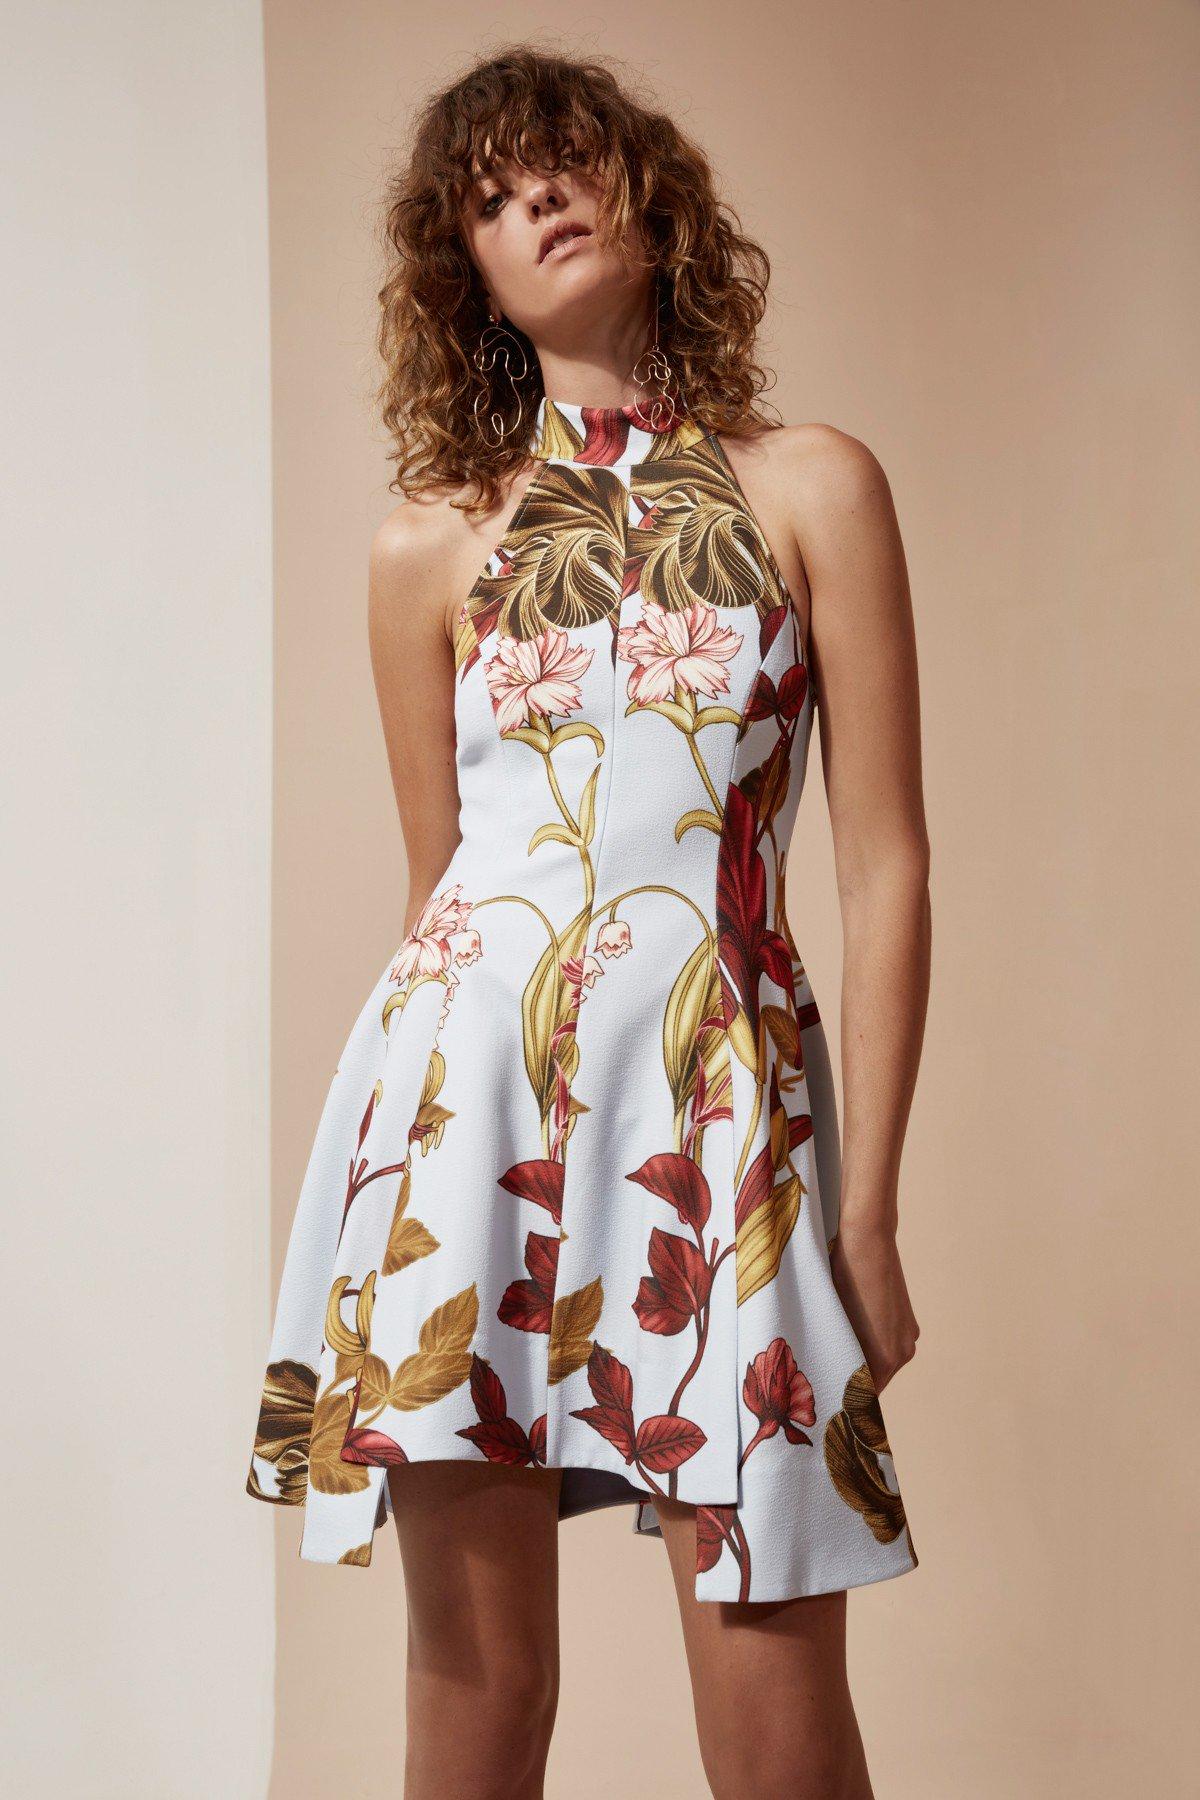 Shop C/MEO Fusion Short Sleeve Dress.